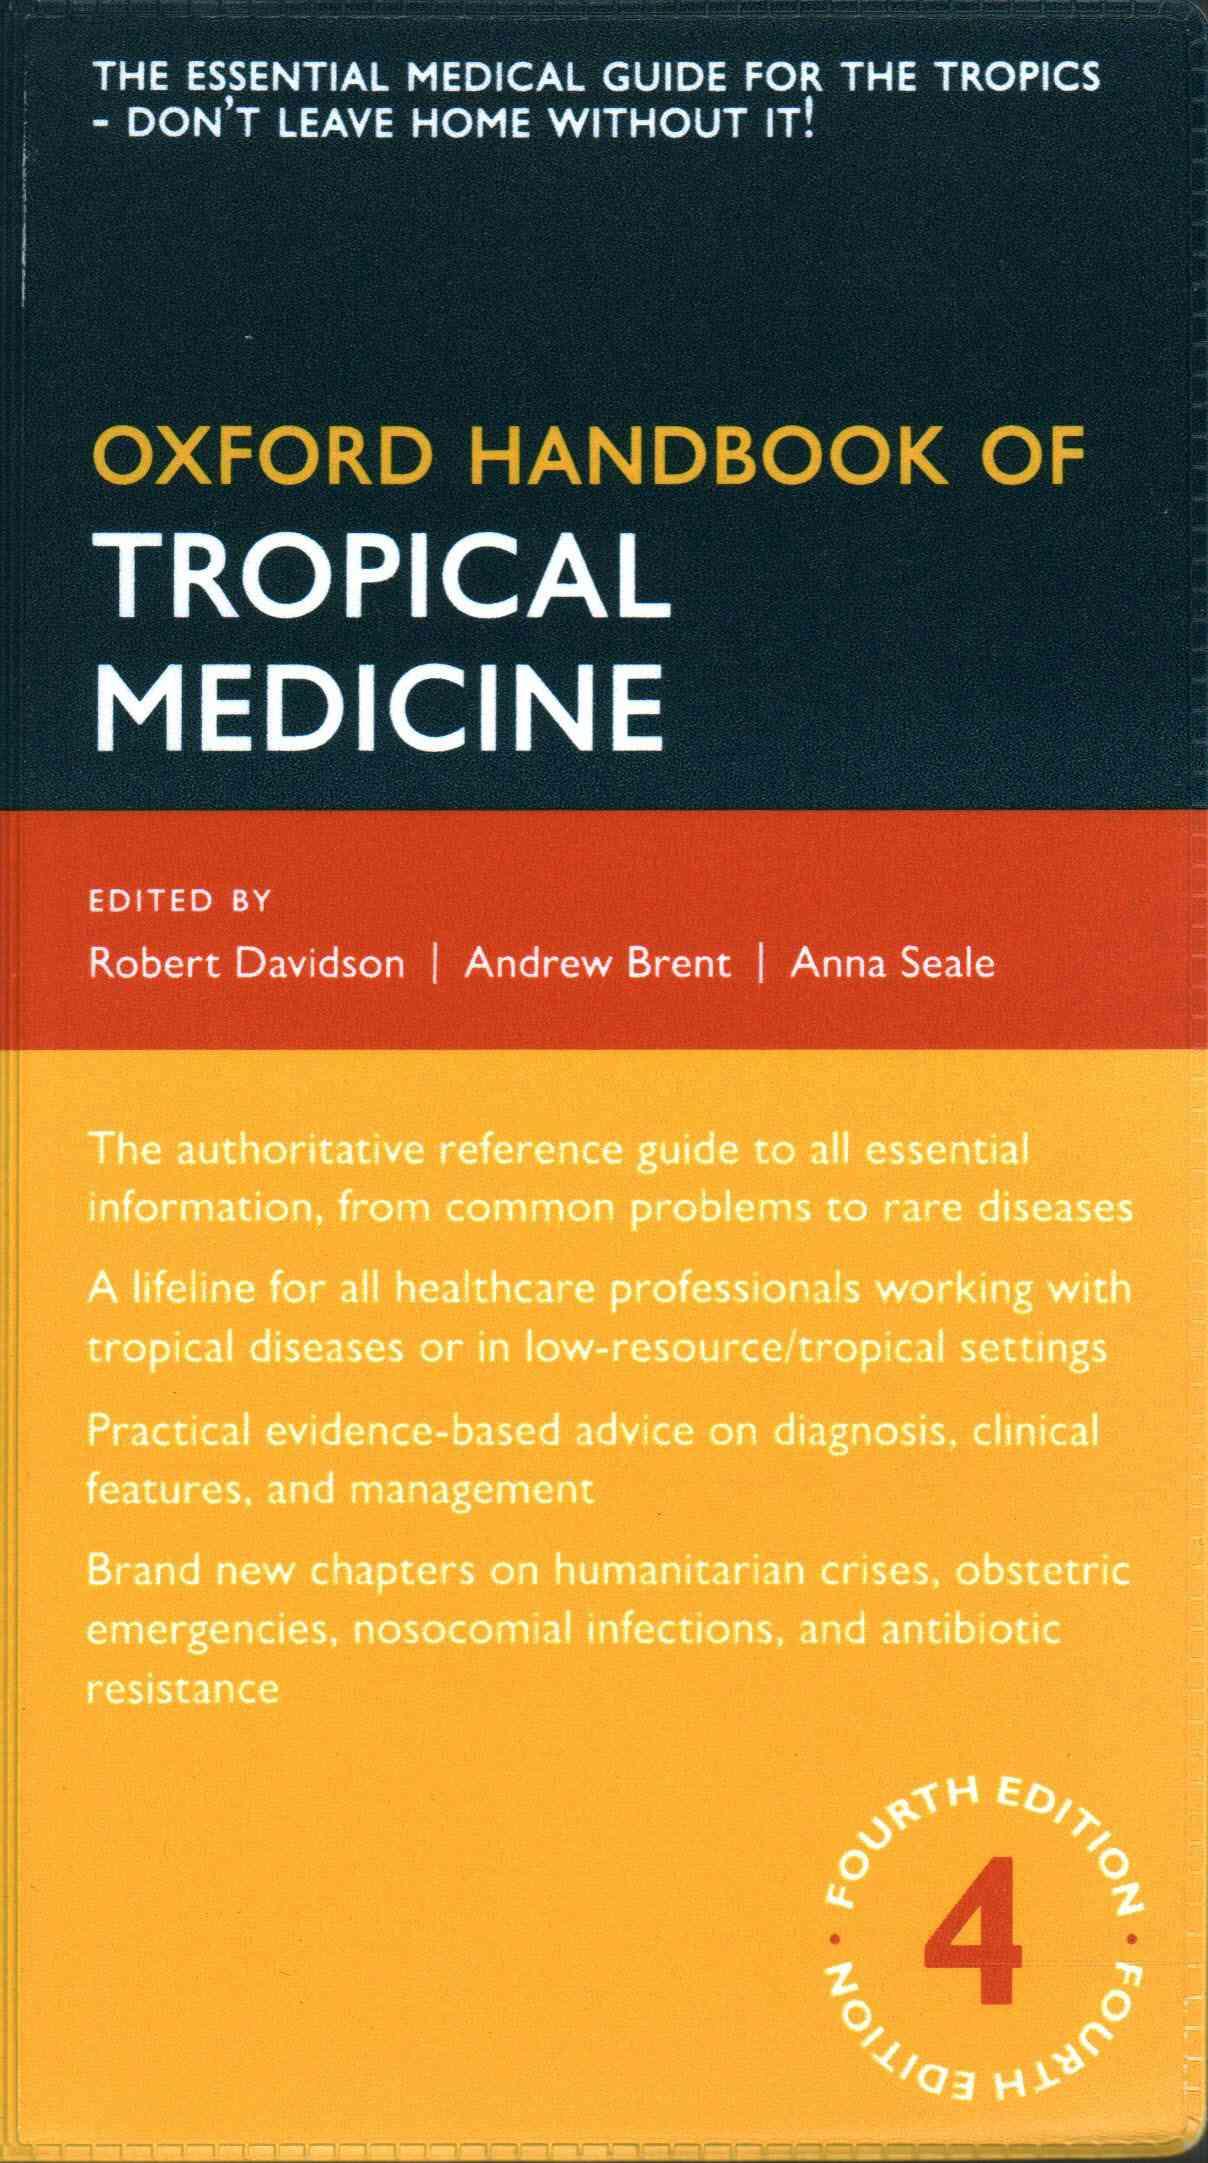 Oxford Handbook of Tropical Medicine By Brent, Andrew/ Davidson, Robert/ Seale, Anna